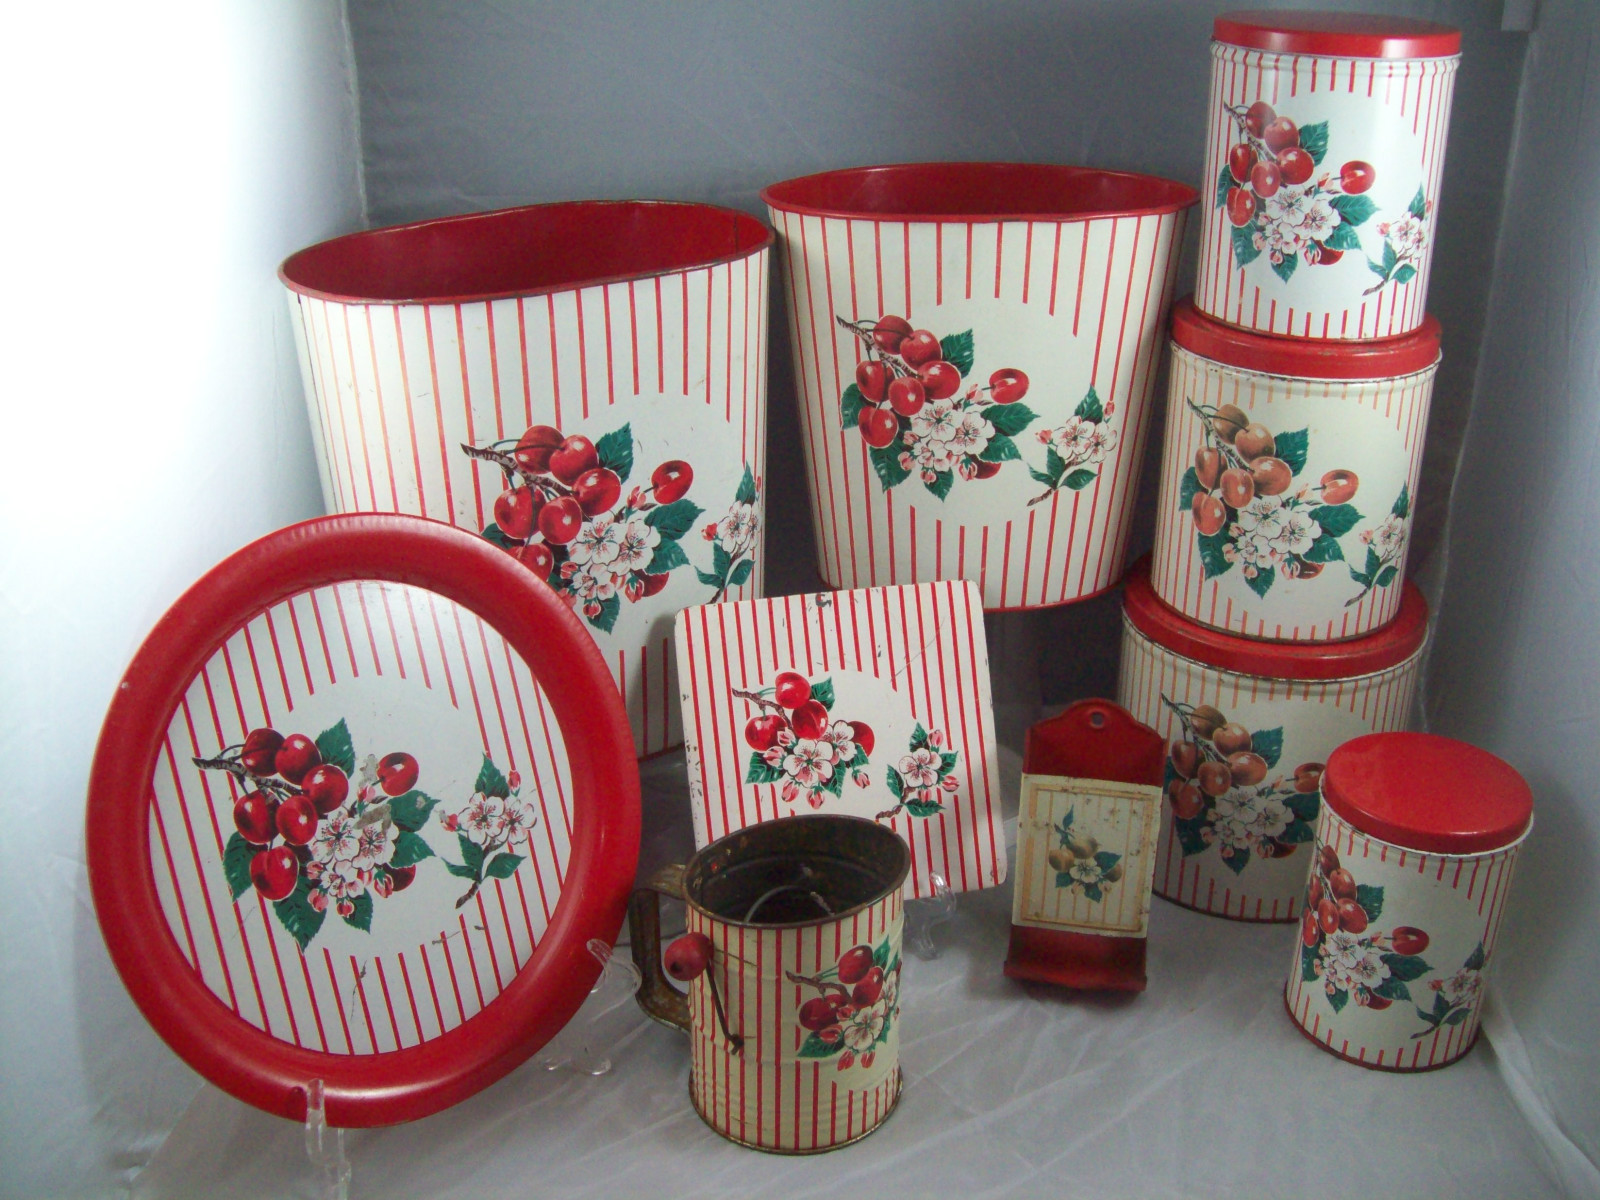 leoladys house collectibles and gardens january 2012 tin set4 jpg